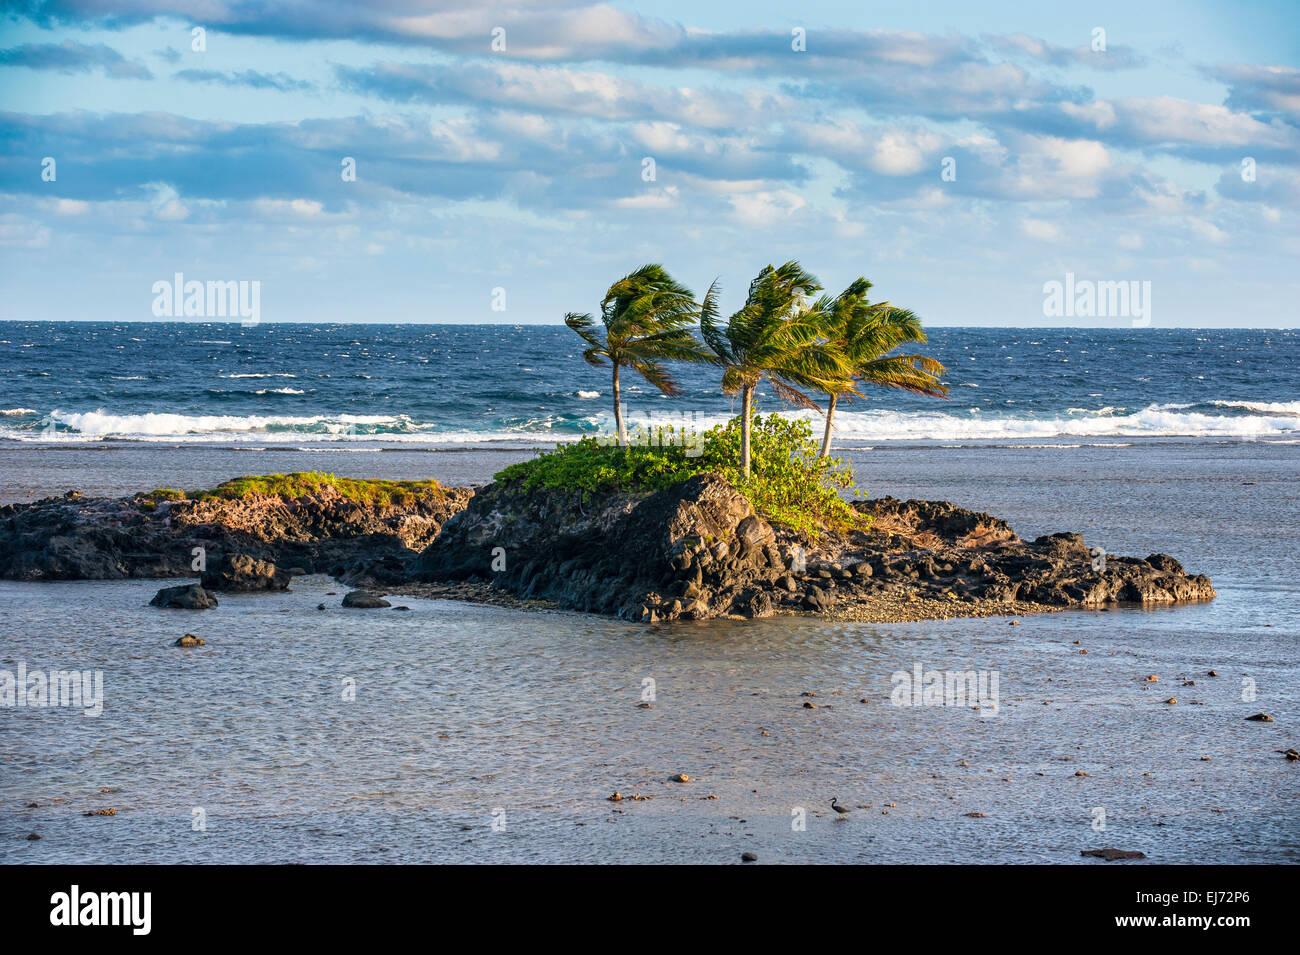 Rocky islet, Tutuila, American Samoa - Stock Image